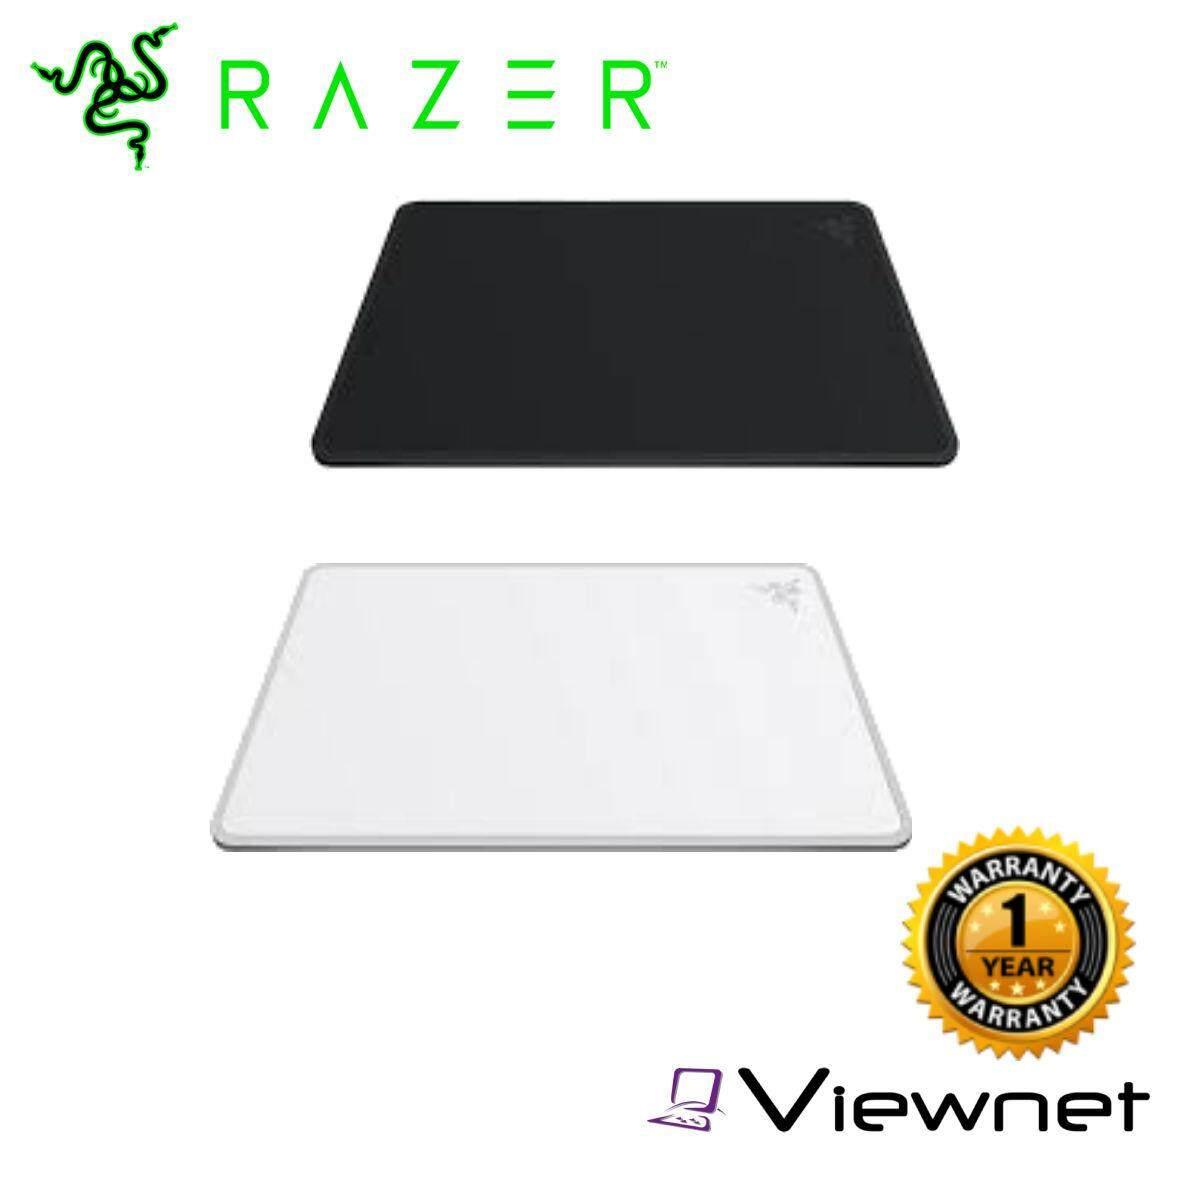 Razer Invicta Gunmetal/Mercury Edition Mouse Pad